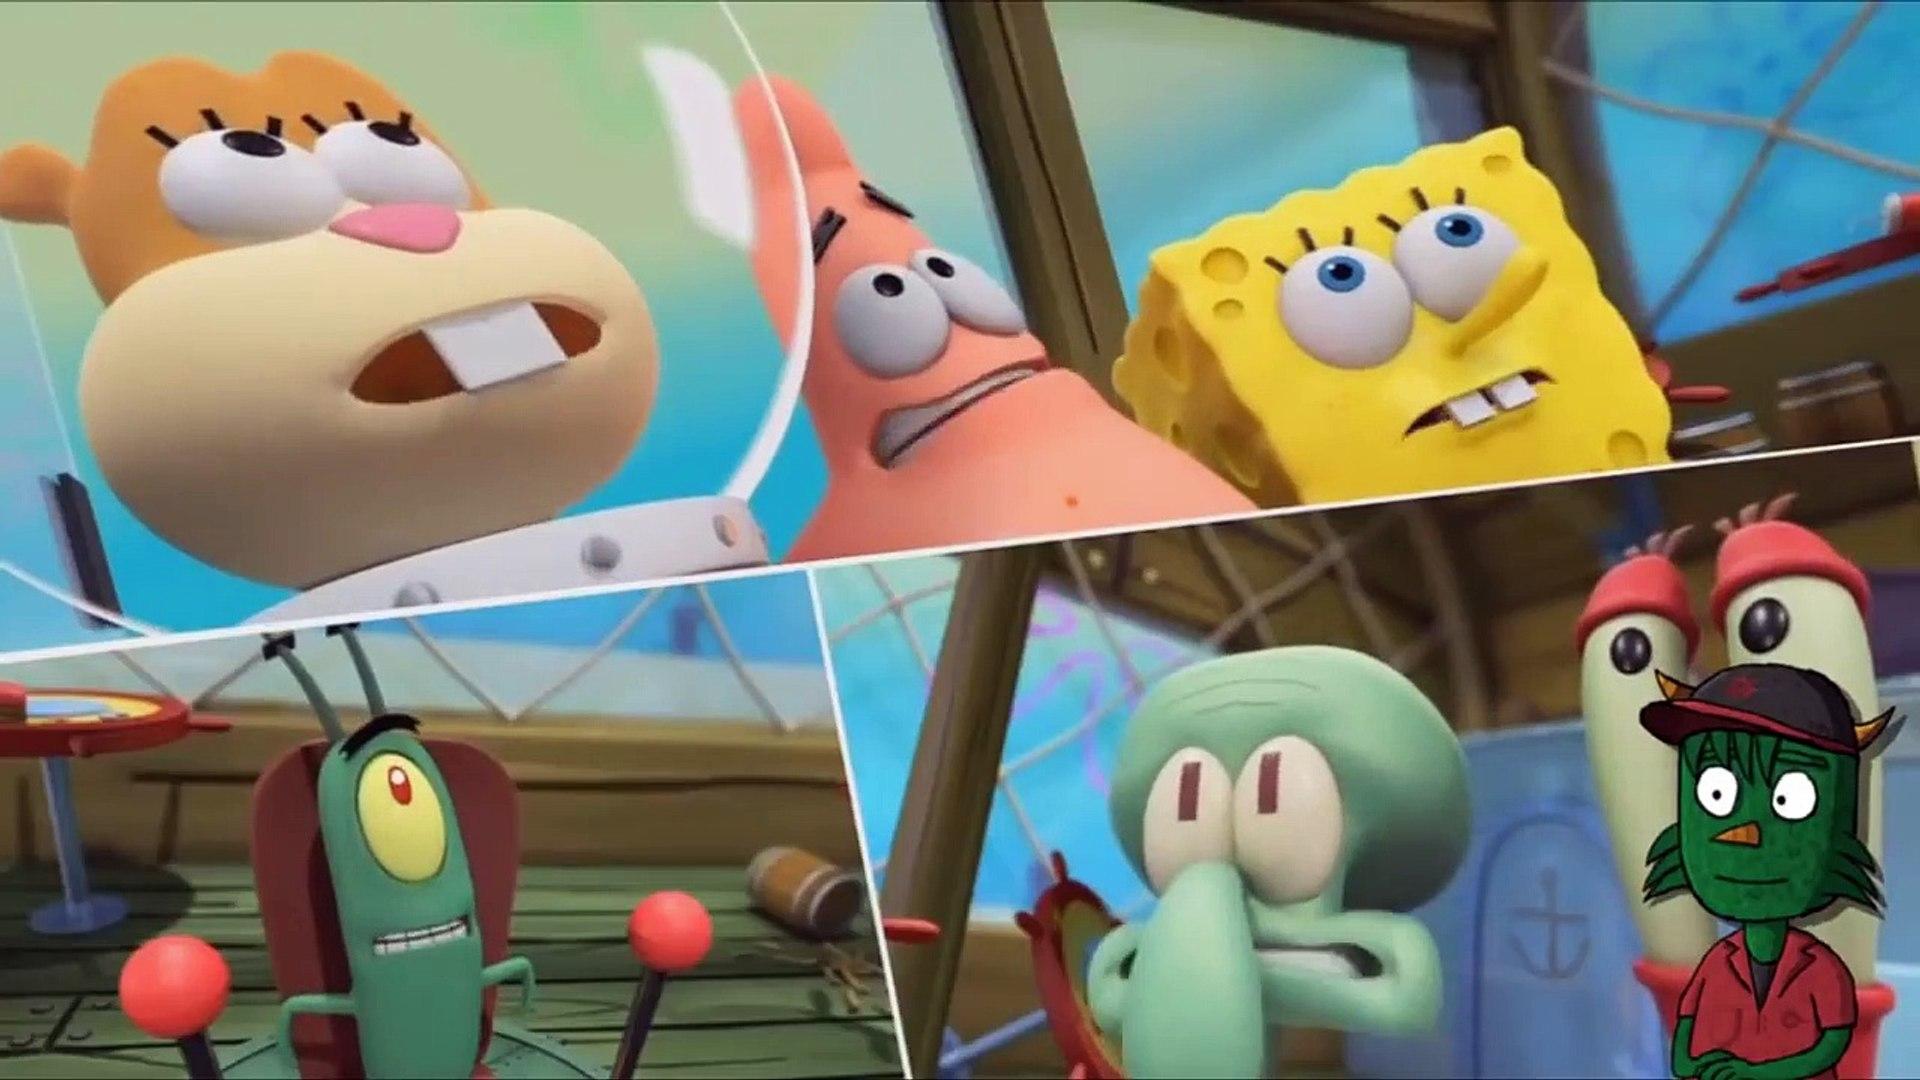 سبونج بوب سكوير بانتس هيرو بانتس لعبة Heropants Spongebob